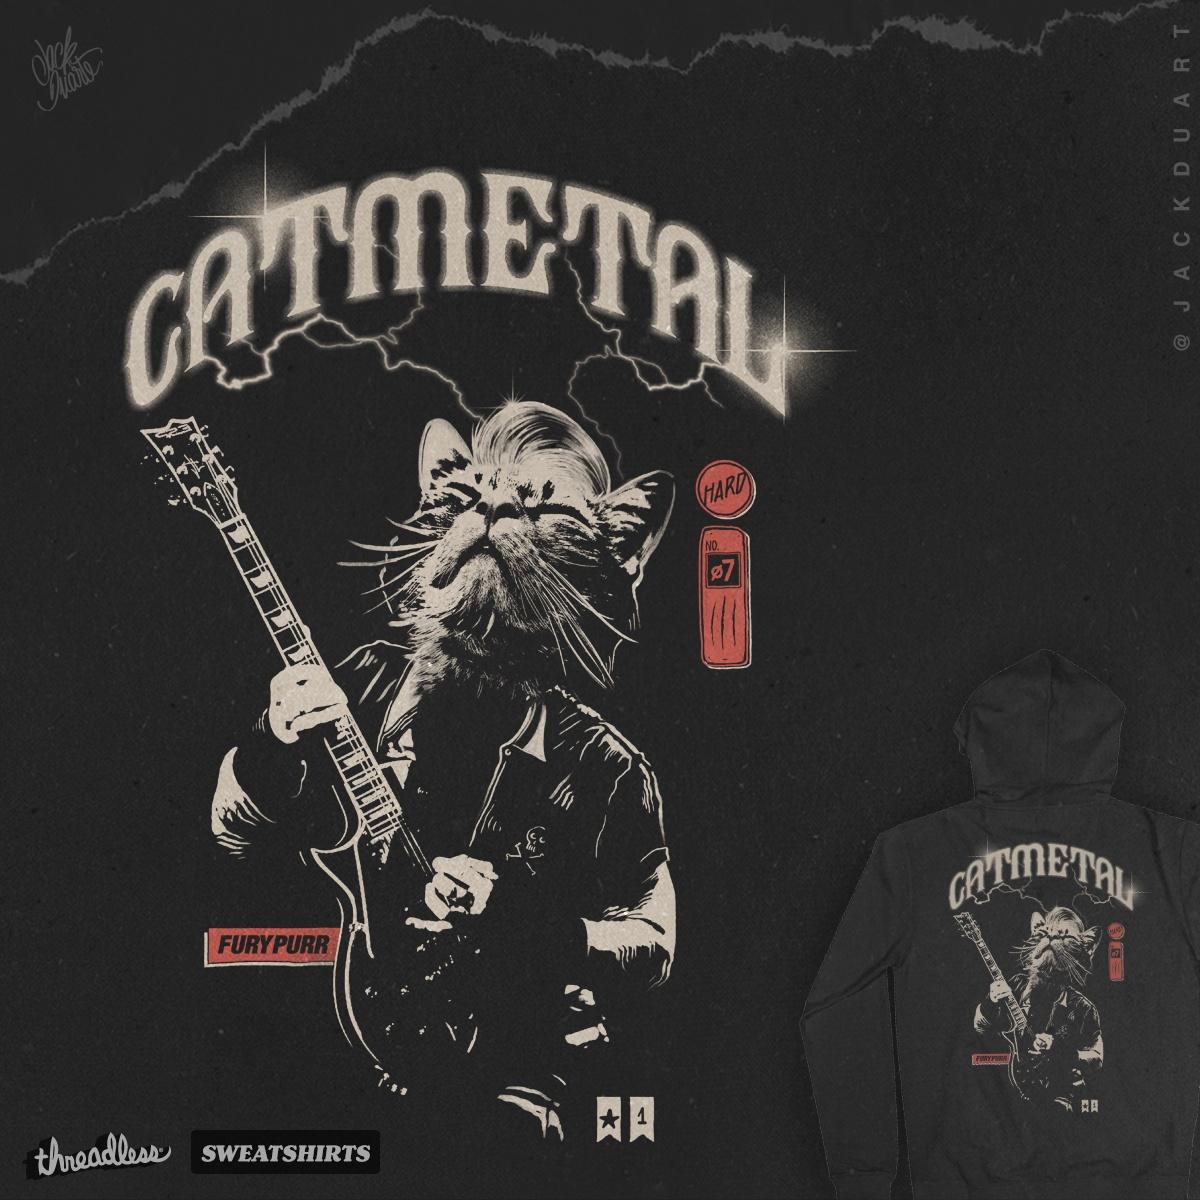 Catmetal by JackDuarte on Threadless